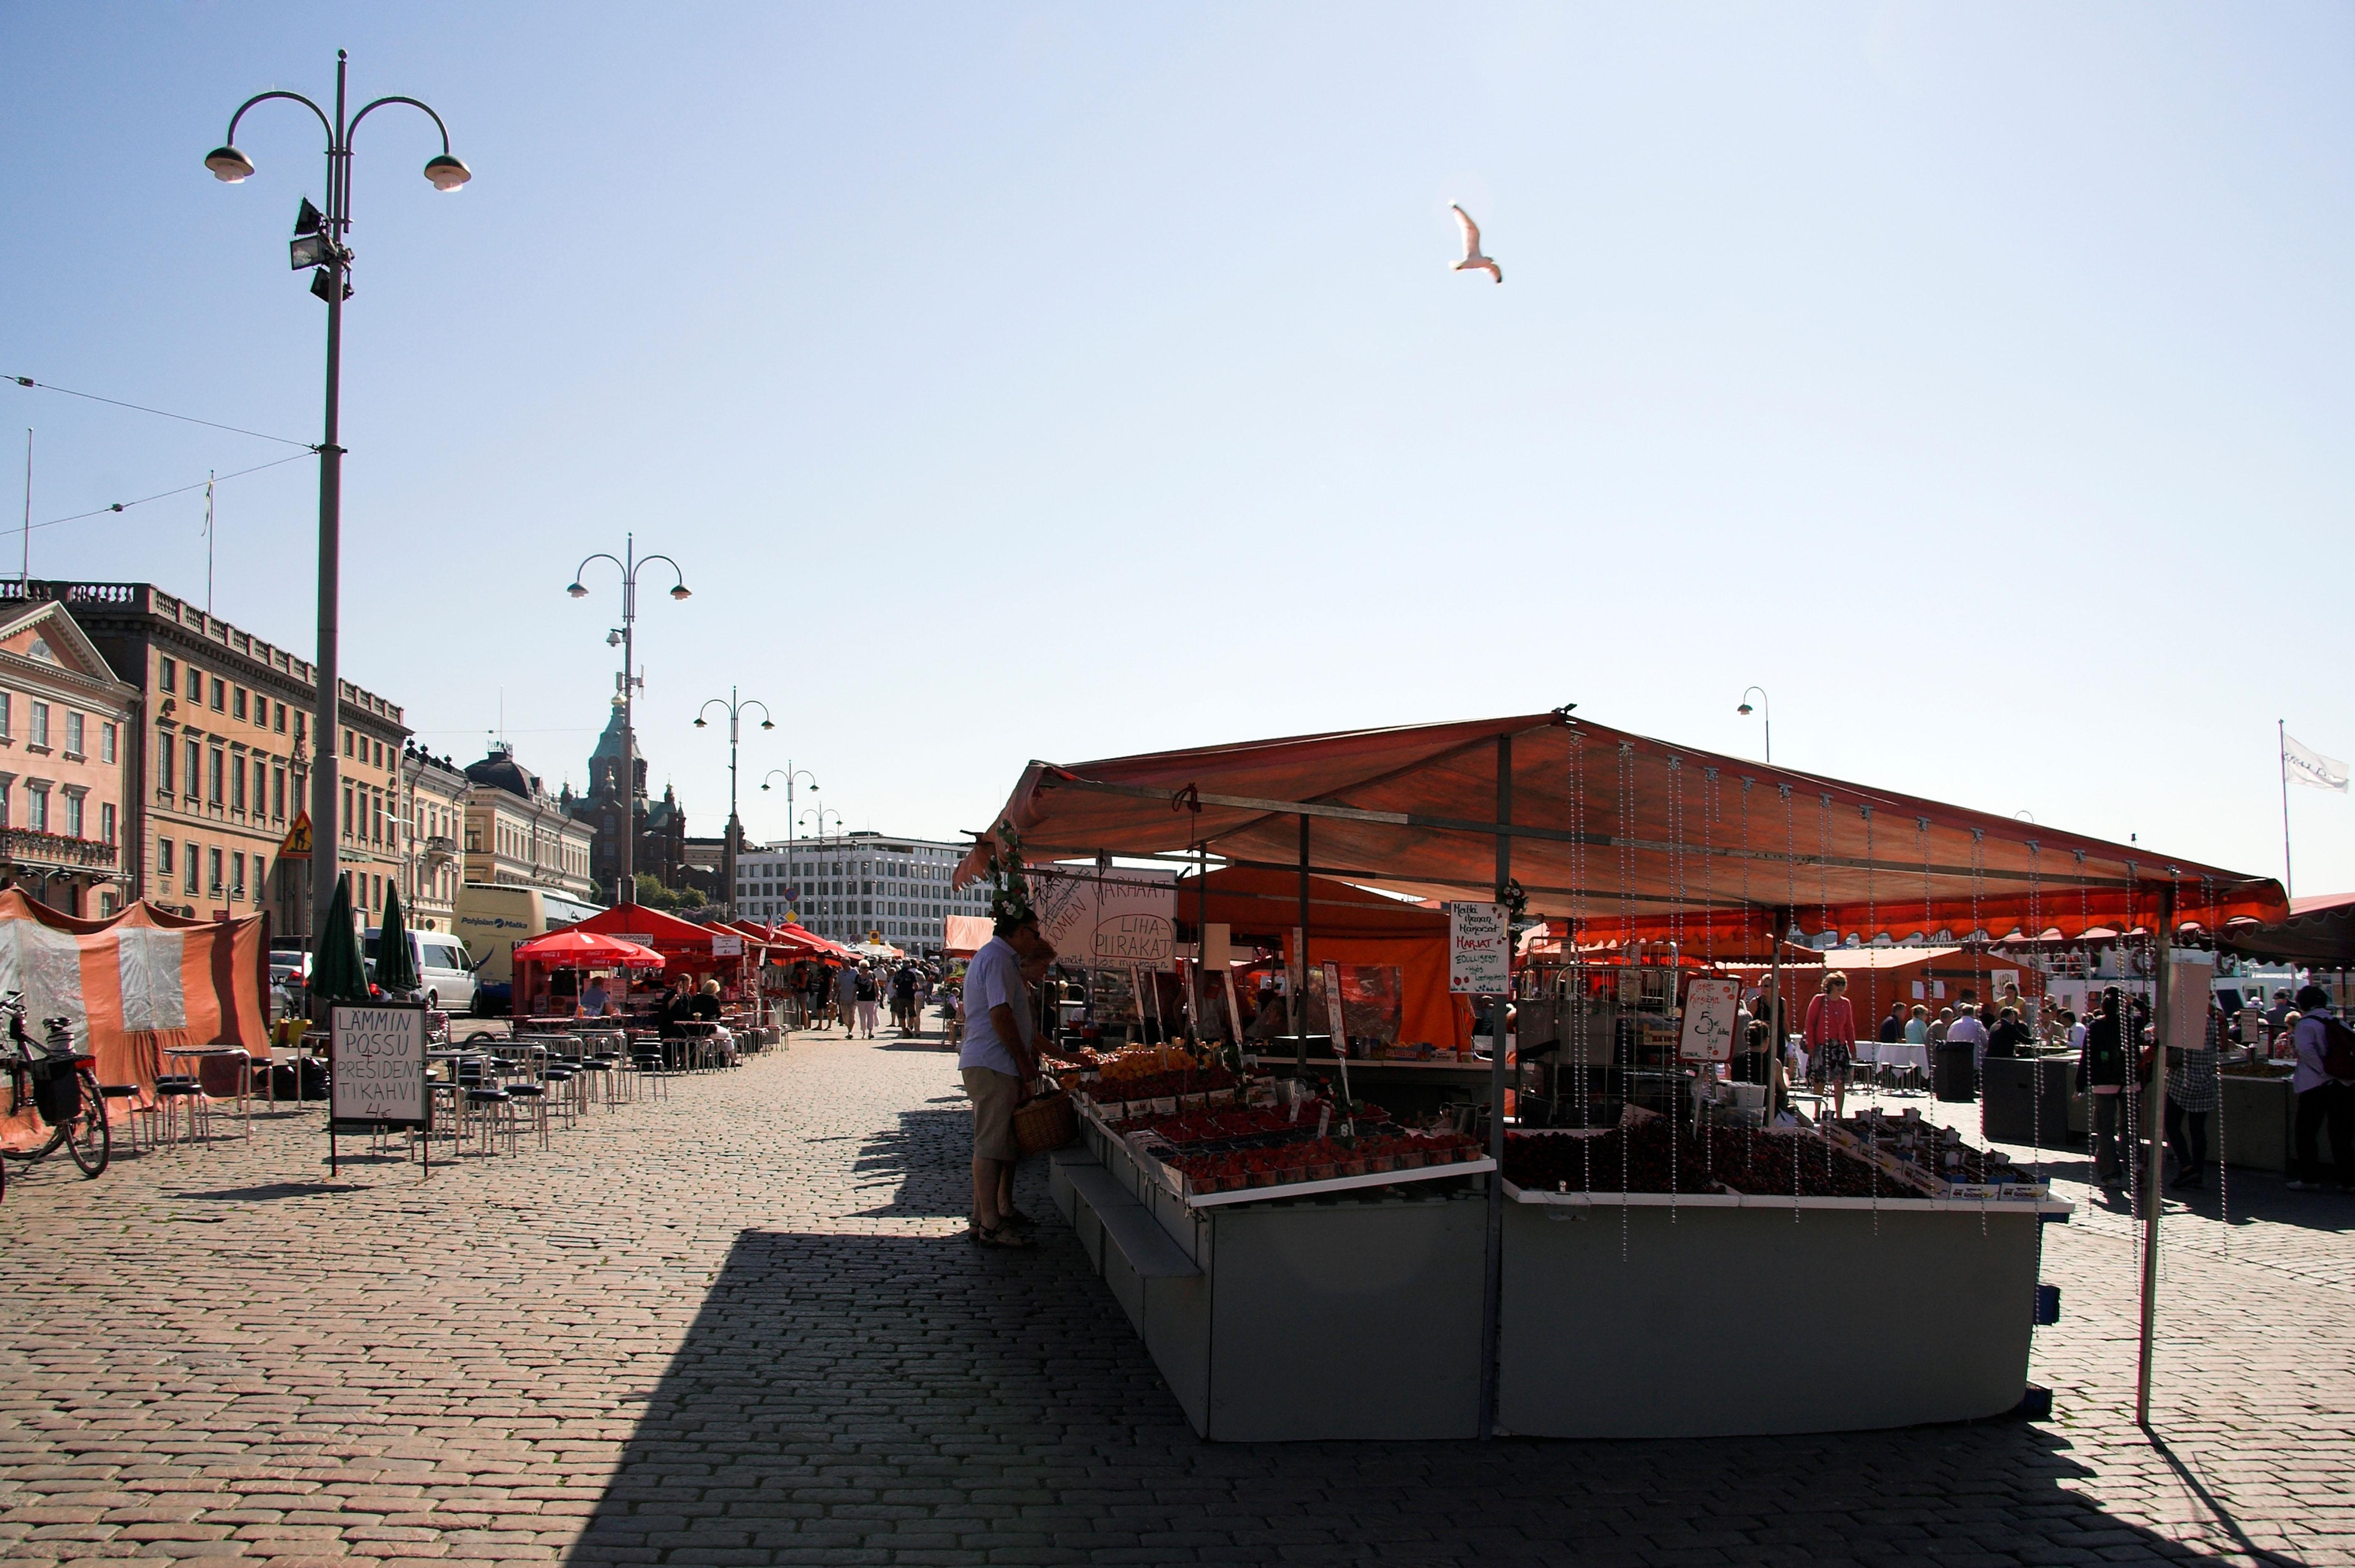 Food stalls, Market Square, Helsinki, Finland. Image shot 06/2011. Exact date unknown.